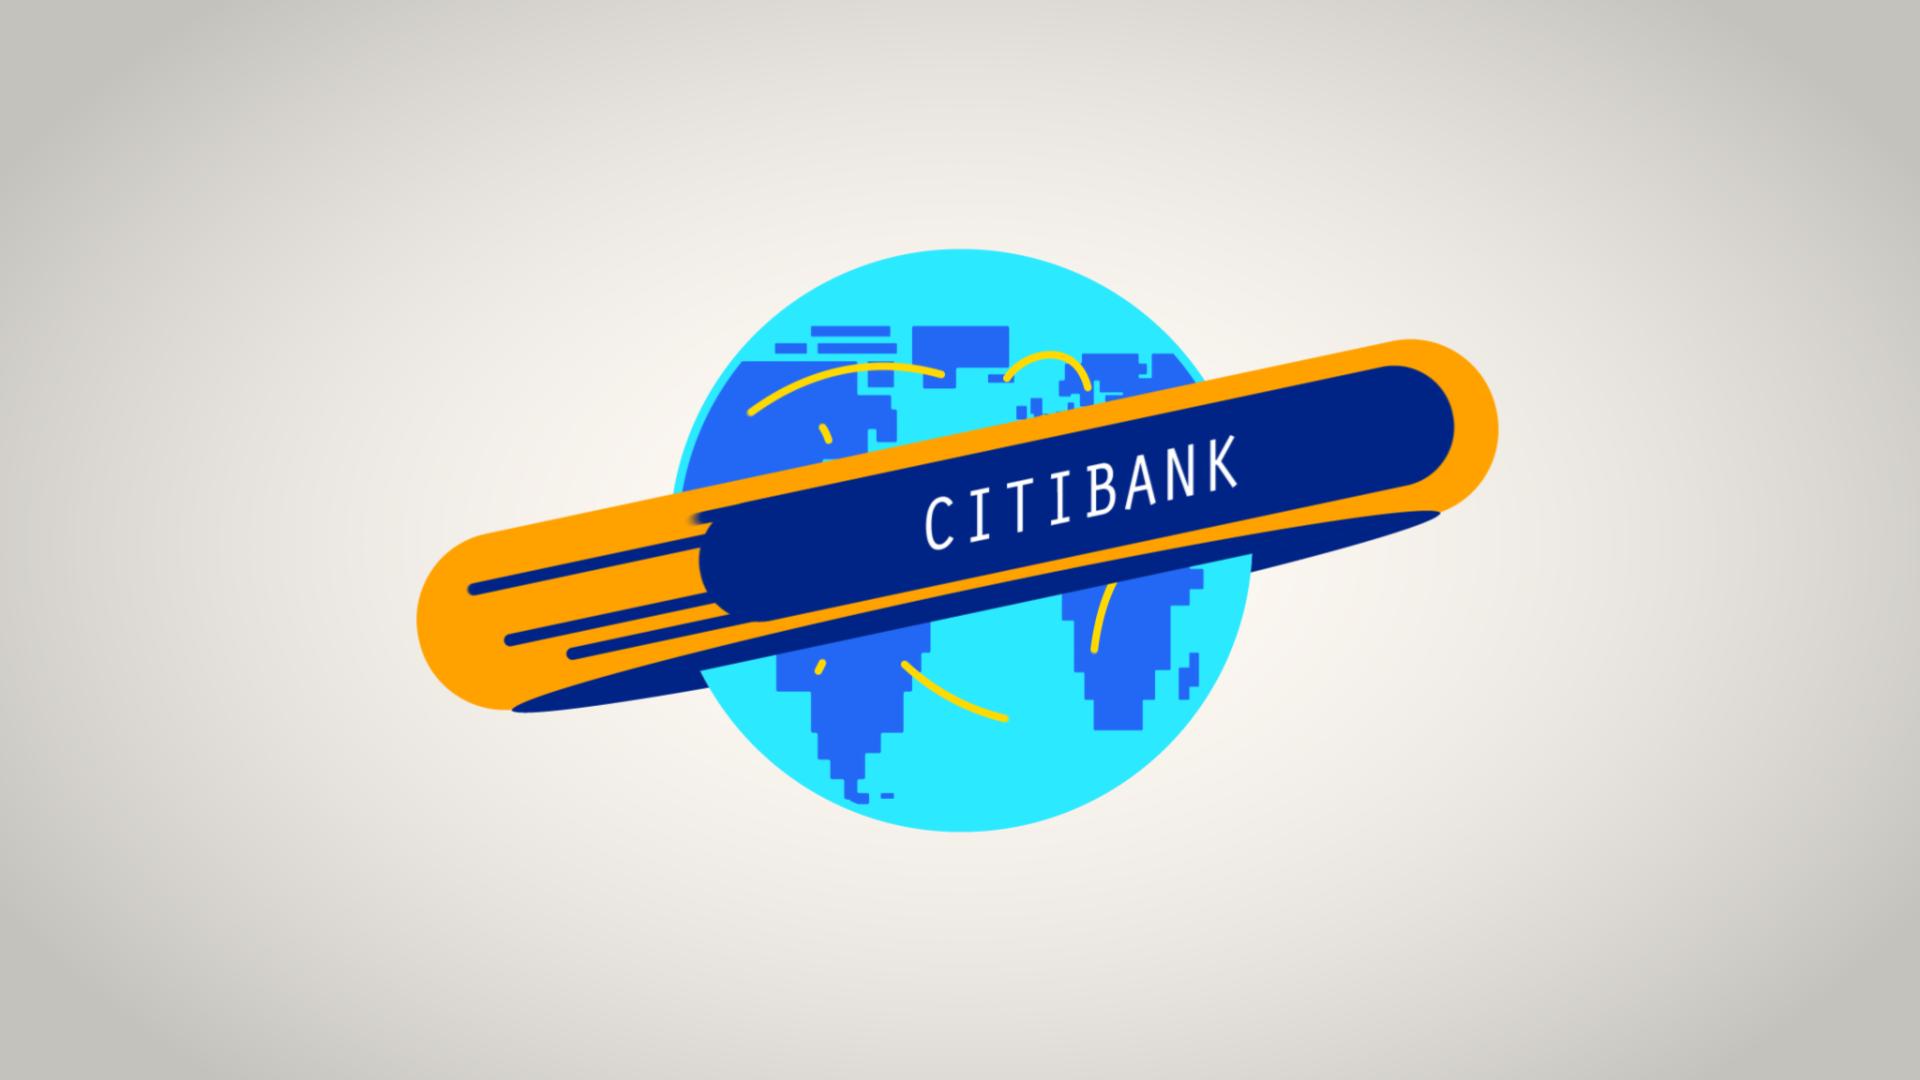 CITI-animacja2 EN audio (1092).png